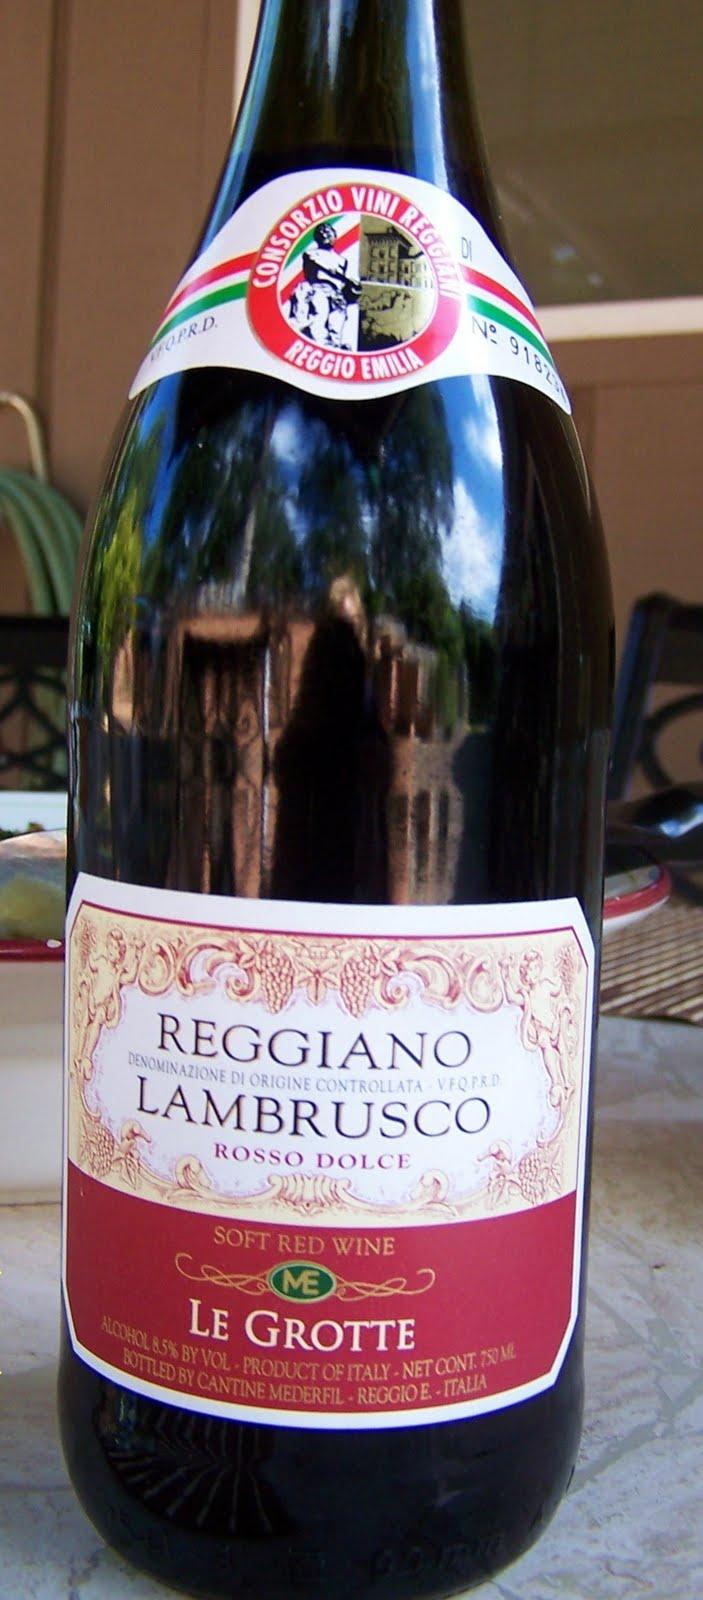 The Edible Life Reggiano Lambrusco Le Grotte Rosso Dolce